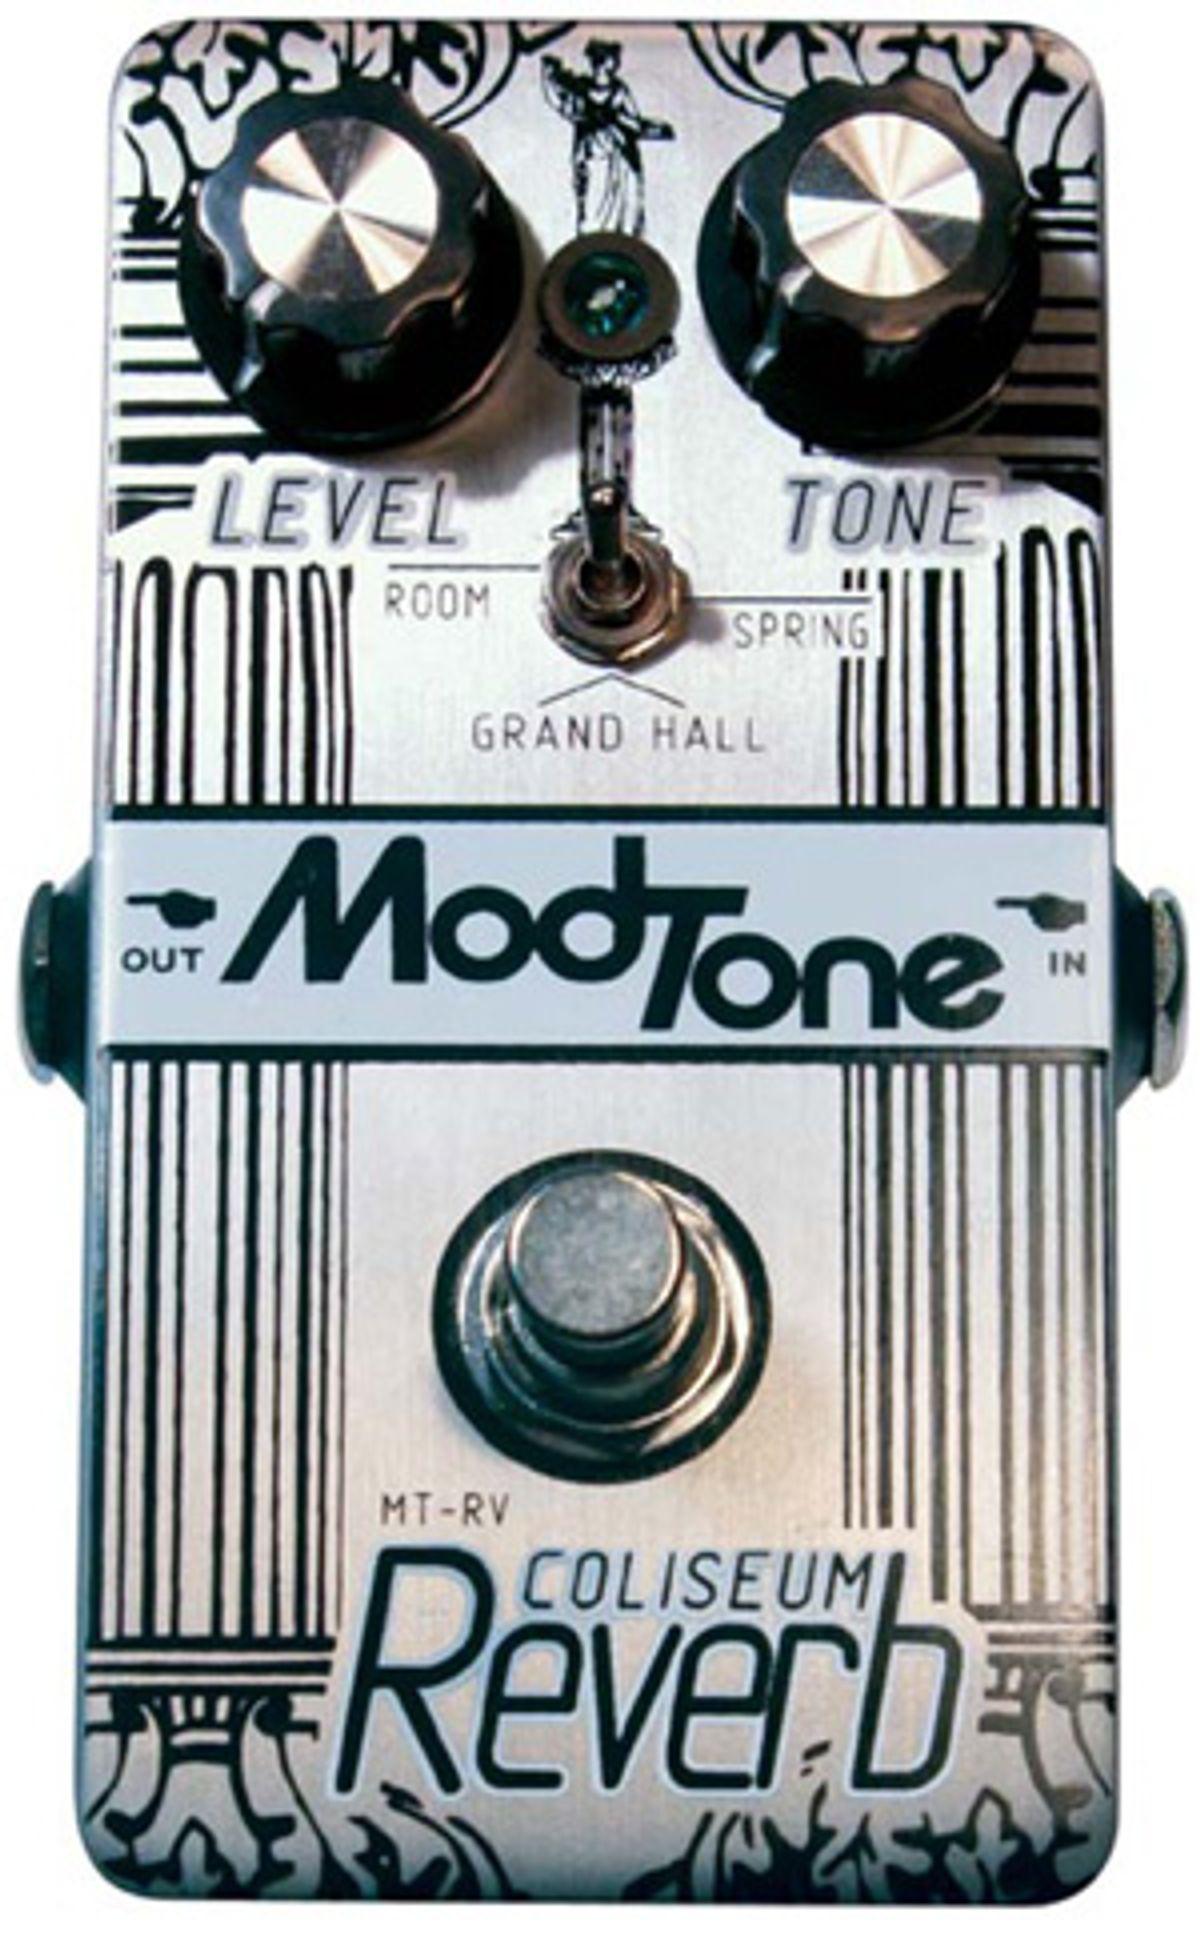 Modtone Effects Coliseum Reverb Pedal Review